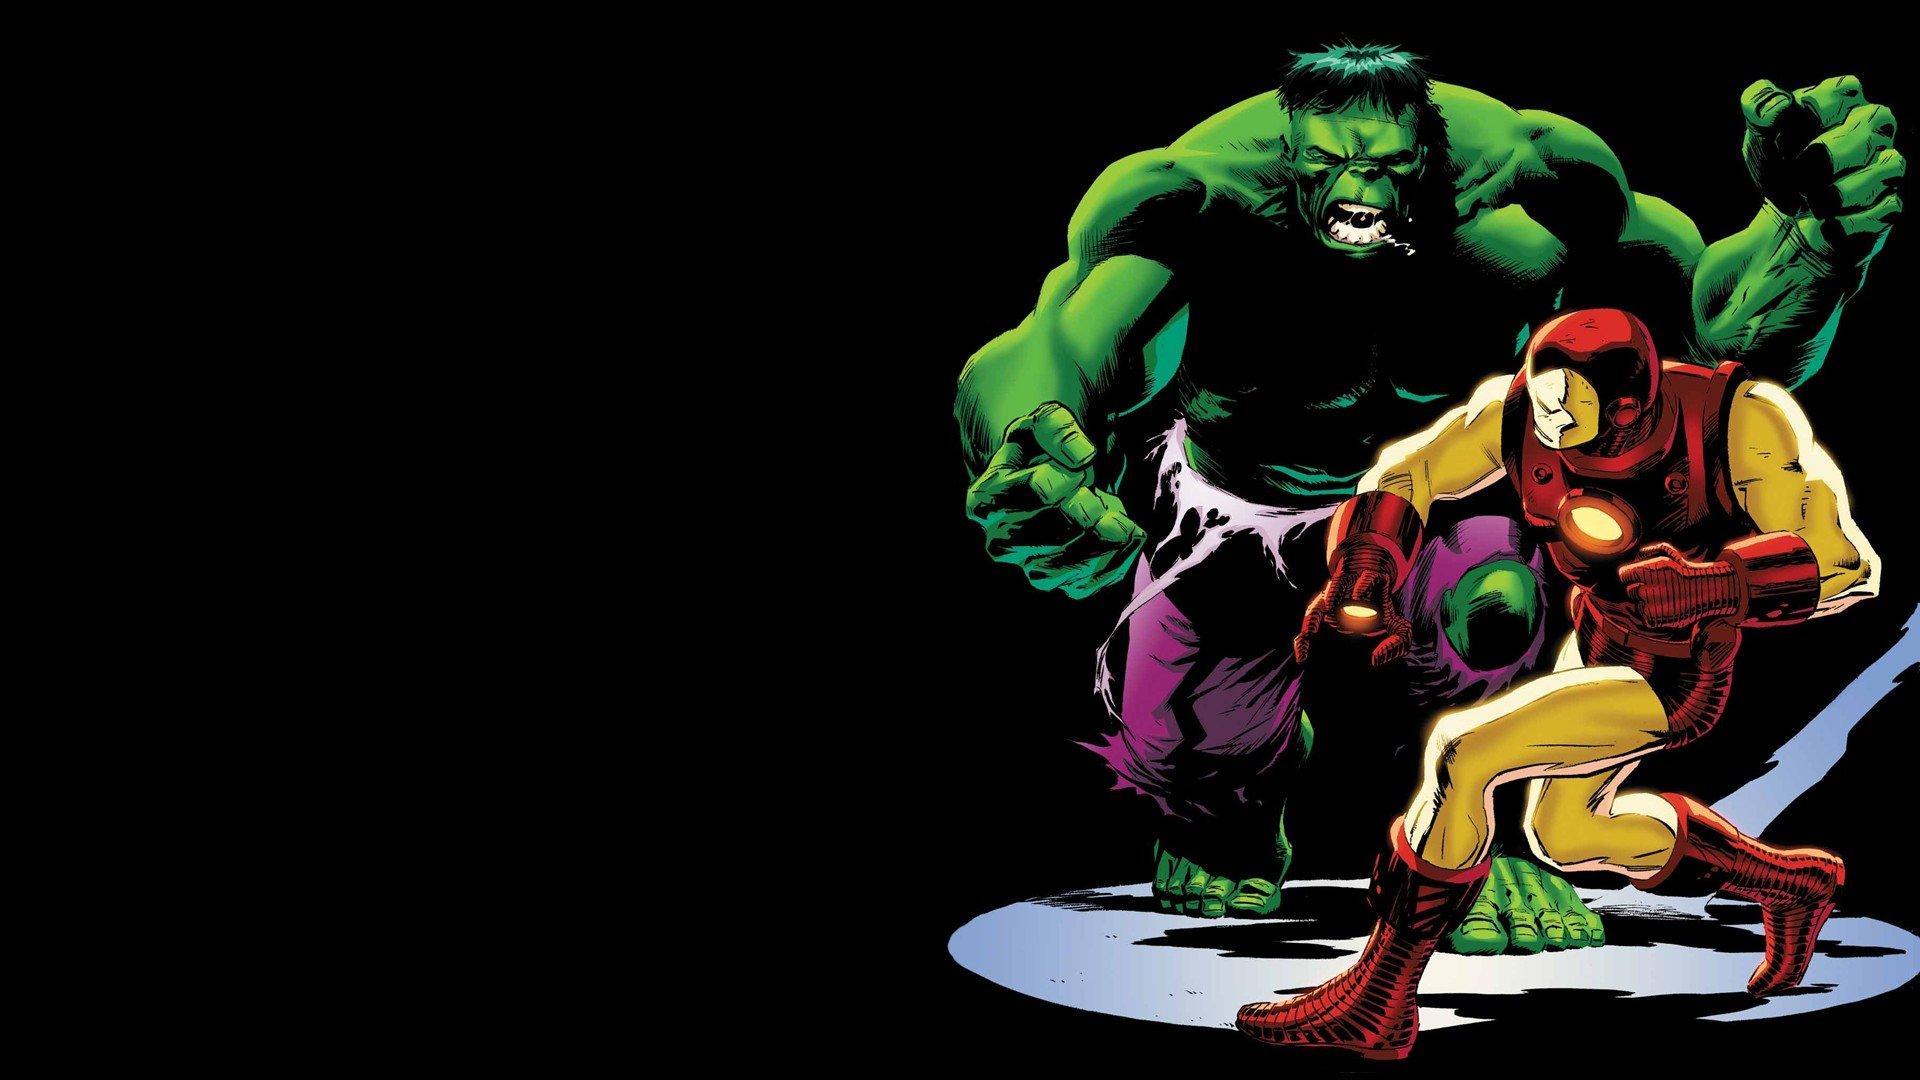 hulk comic character iron man comics wallpaper